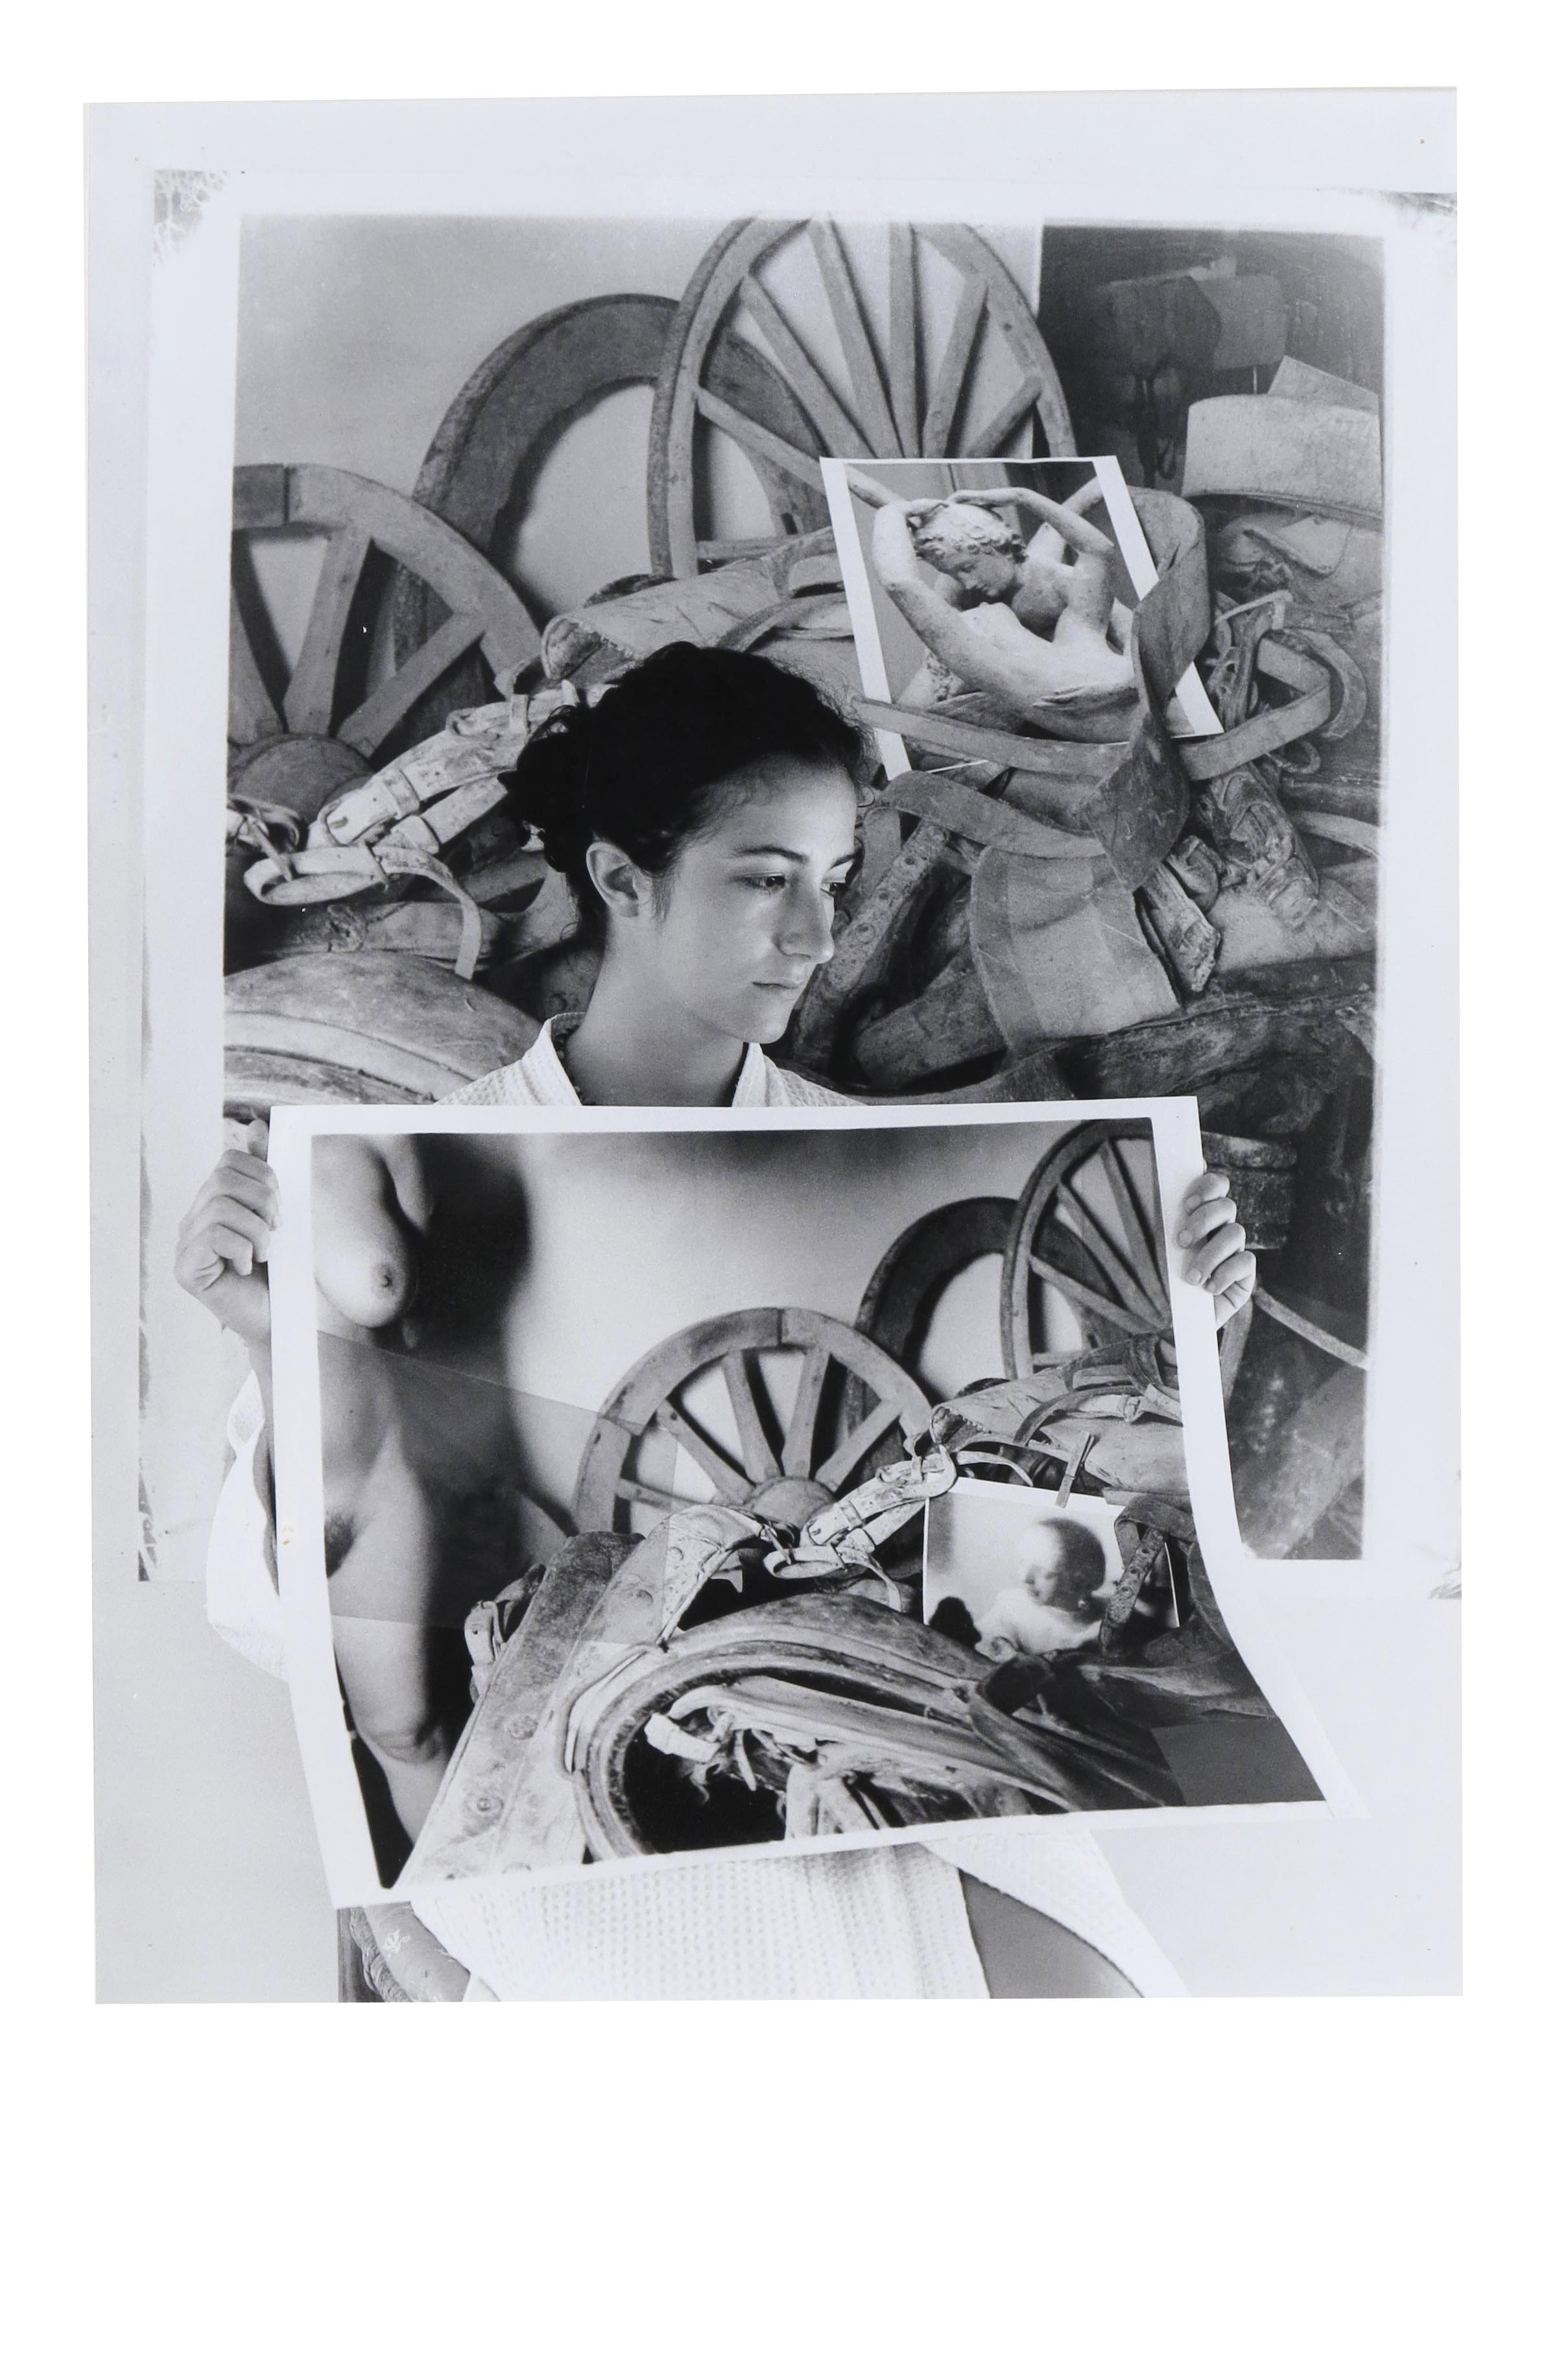 Carlotta at Castel Ruggero II  2014  gelatin silver print  20 x 16 inches